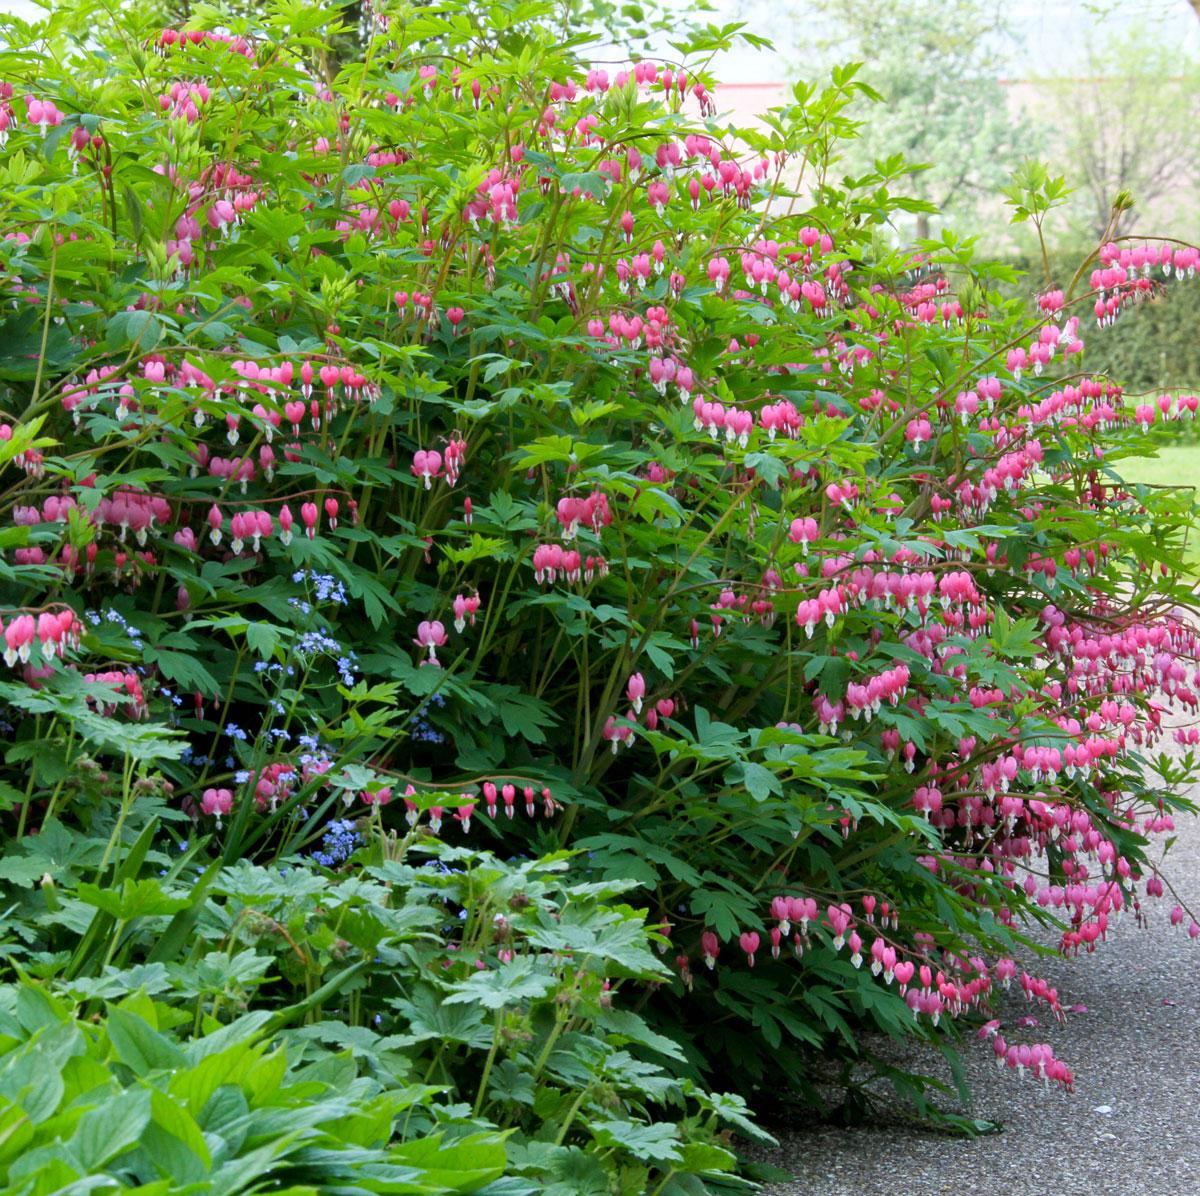 Plants for Your Flower Garden - Bleeding Heart - Longfield Gardens